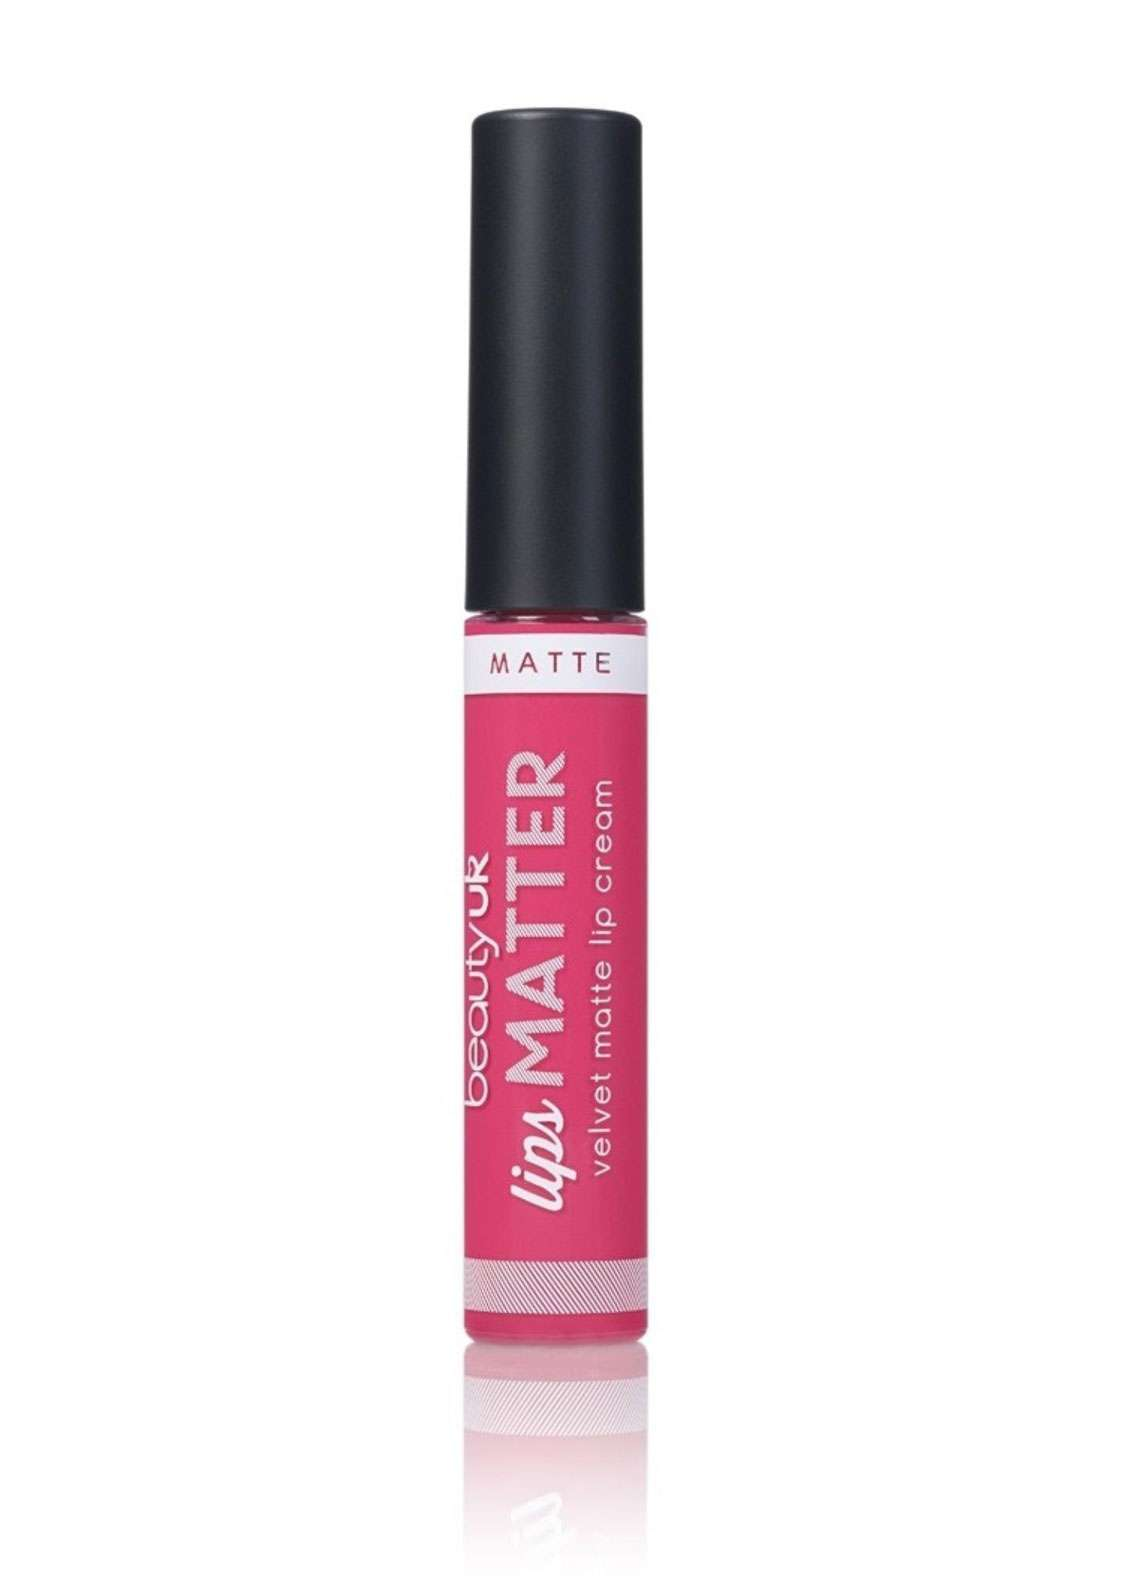 Beauty UK Lips Matter - 5 Wham Bam Thank You Jam